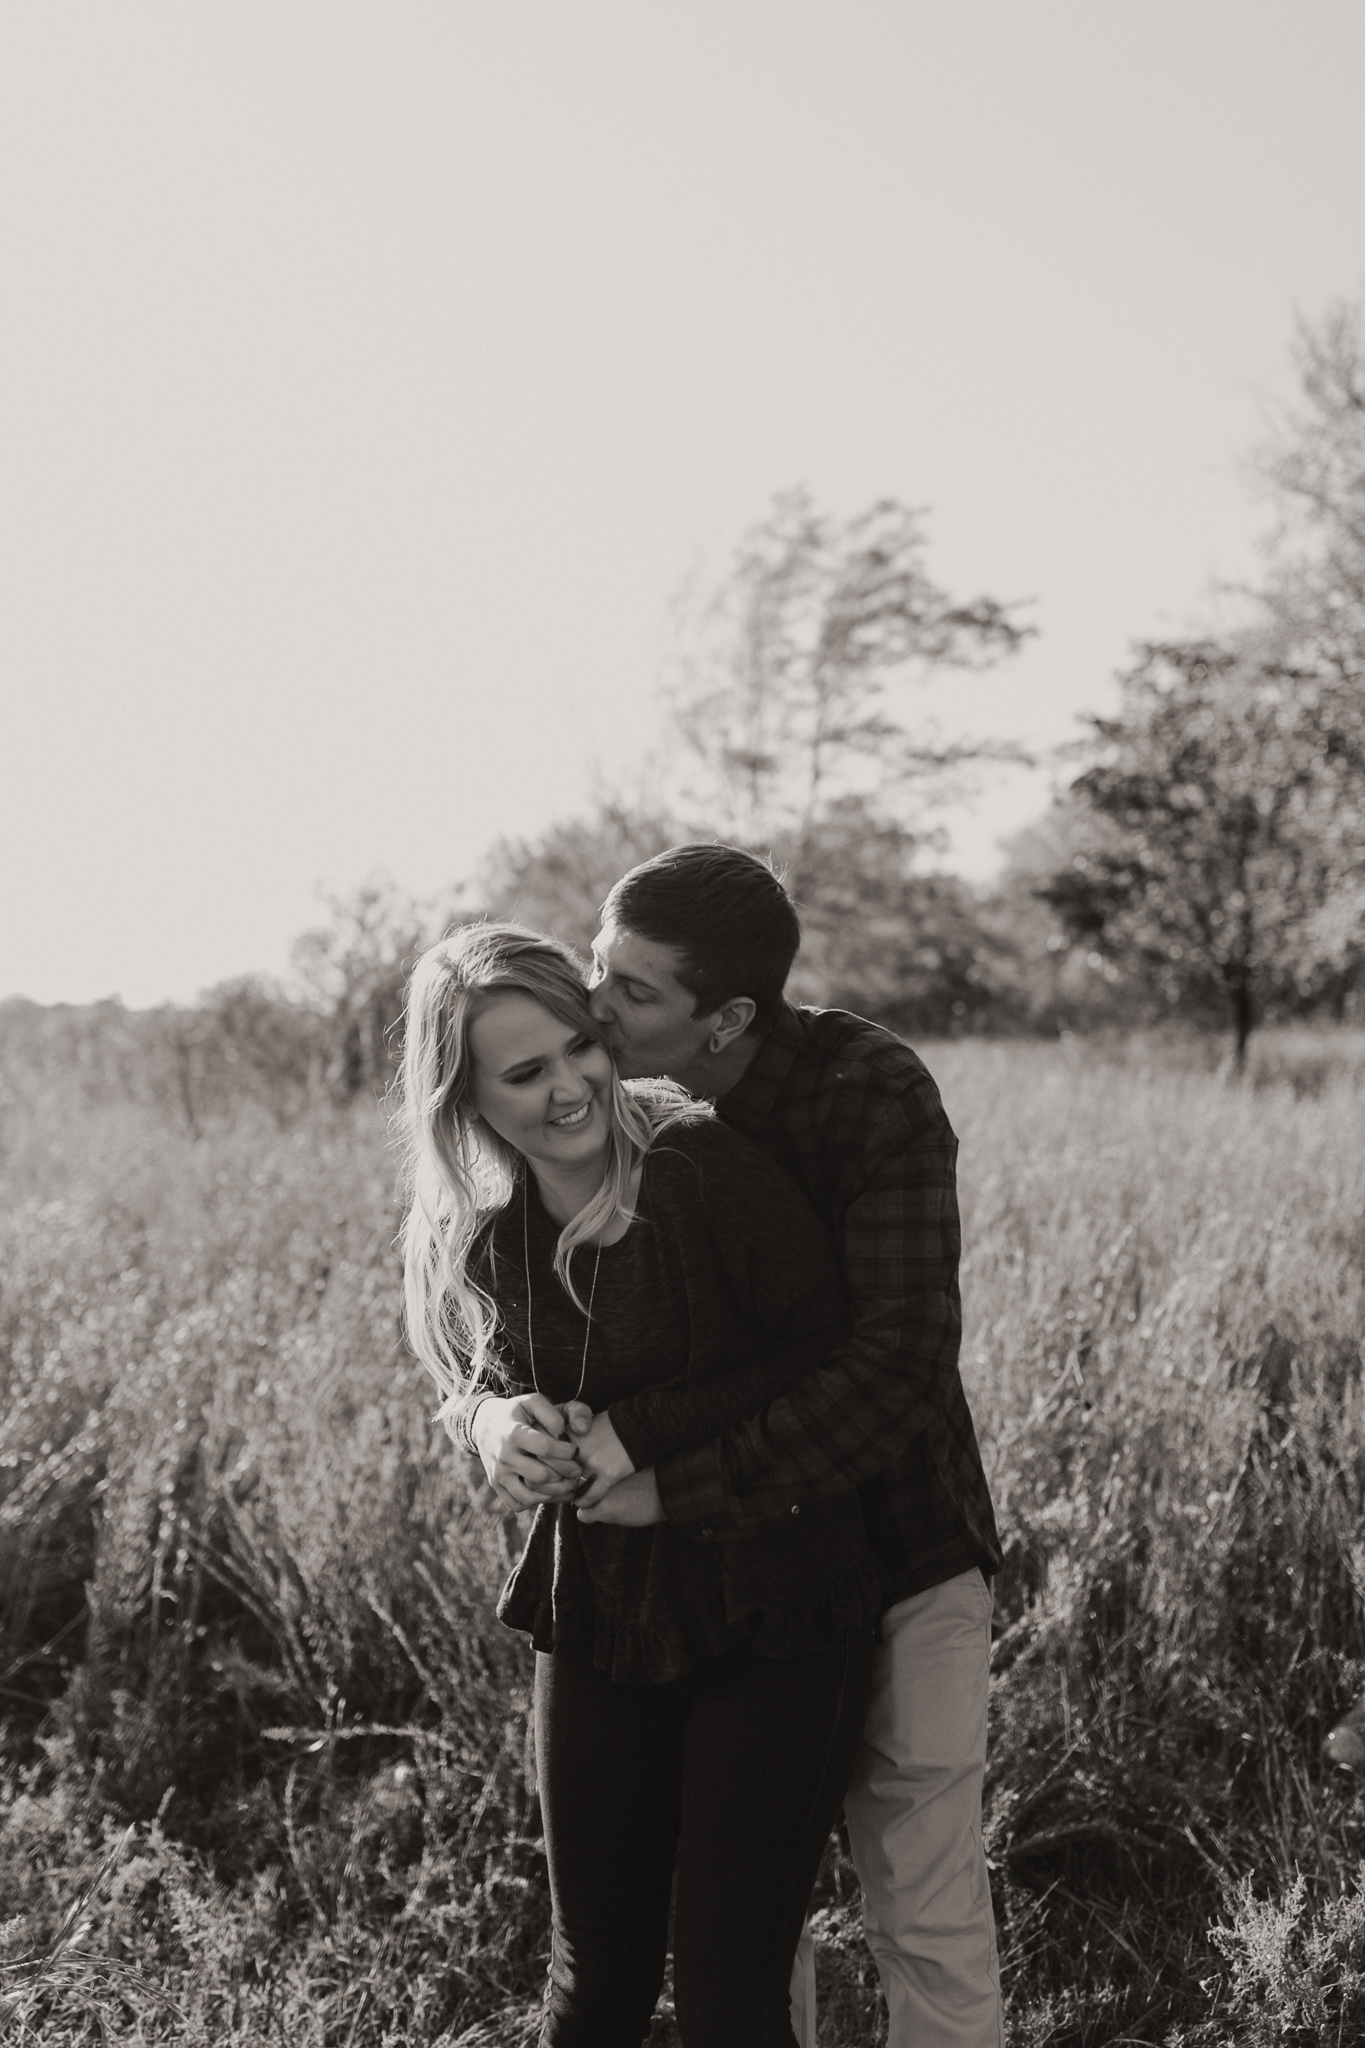 Kyle + Brittany | Fall Lake Engagement Photos | Oklahoma Lifestyle Photographer-1.jpg